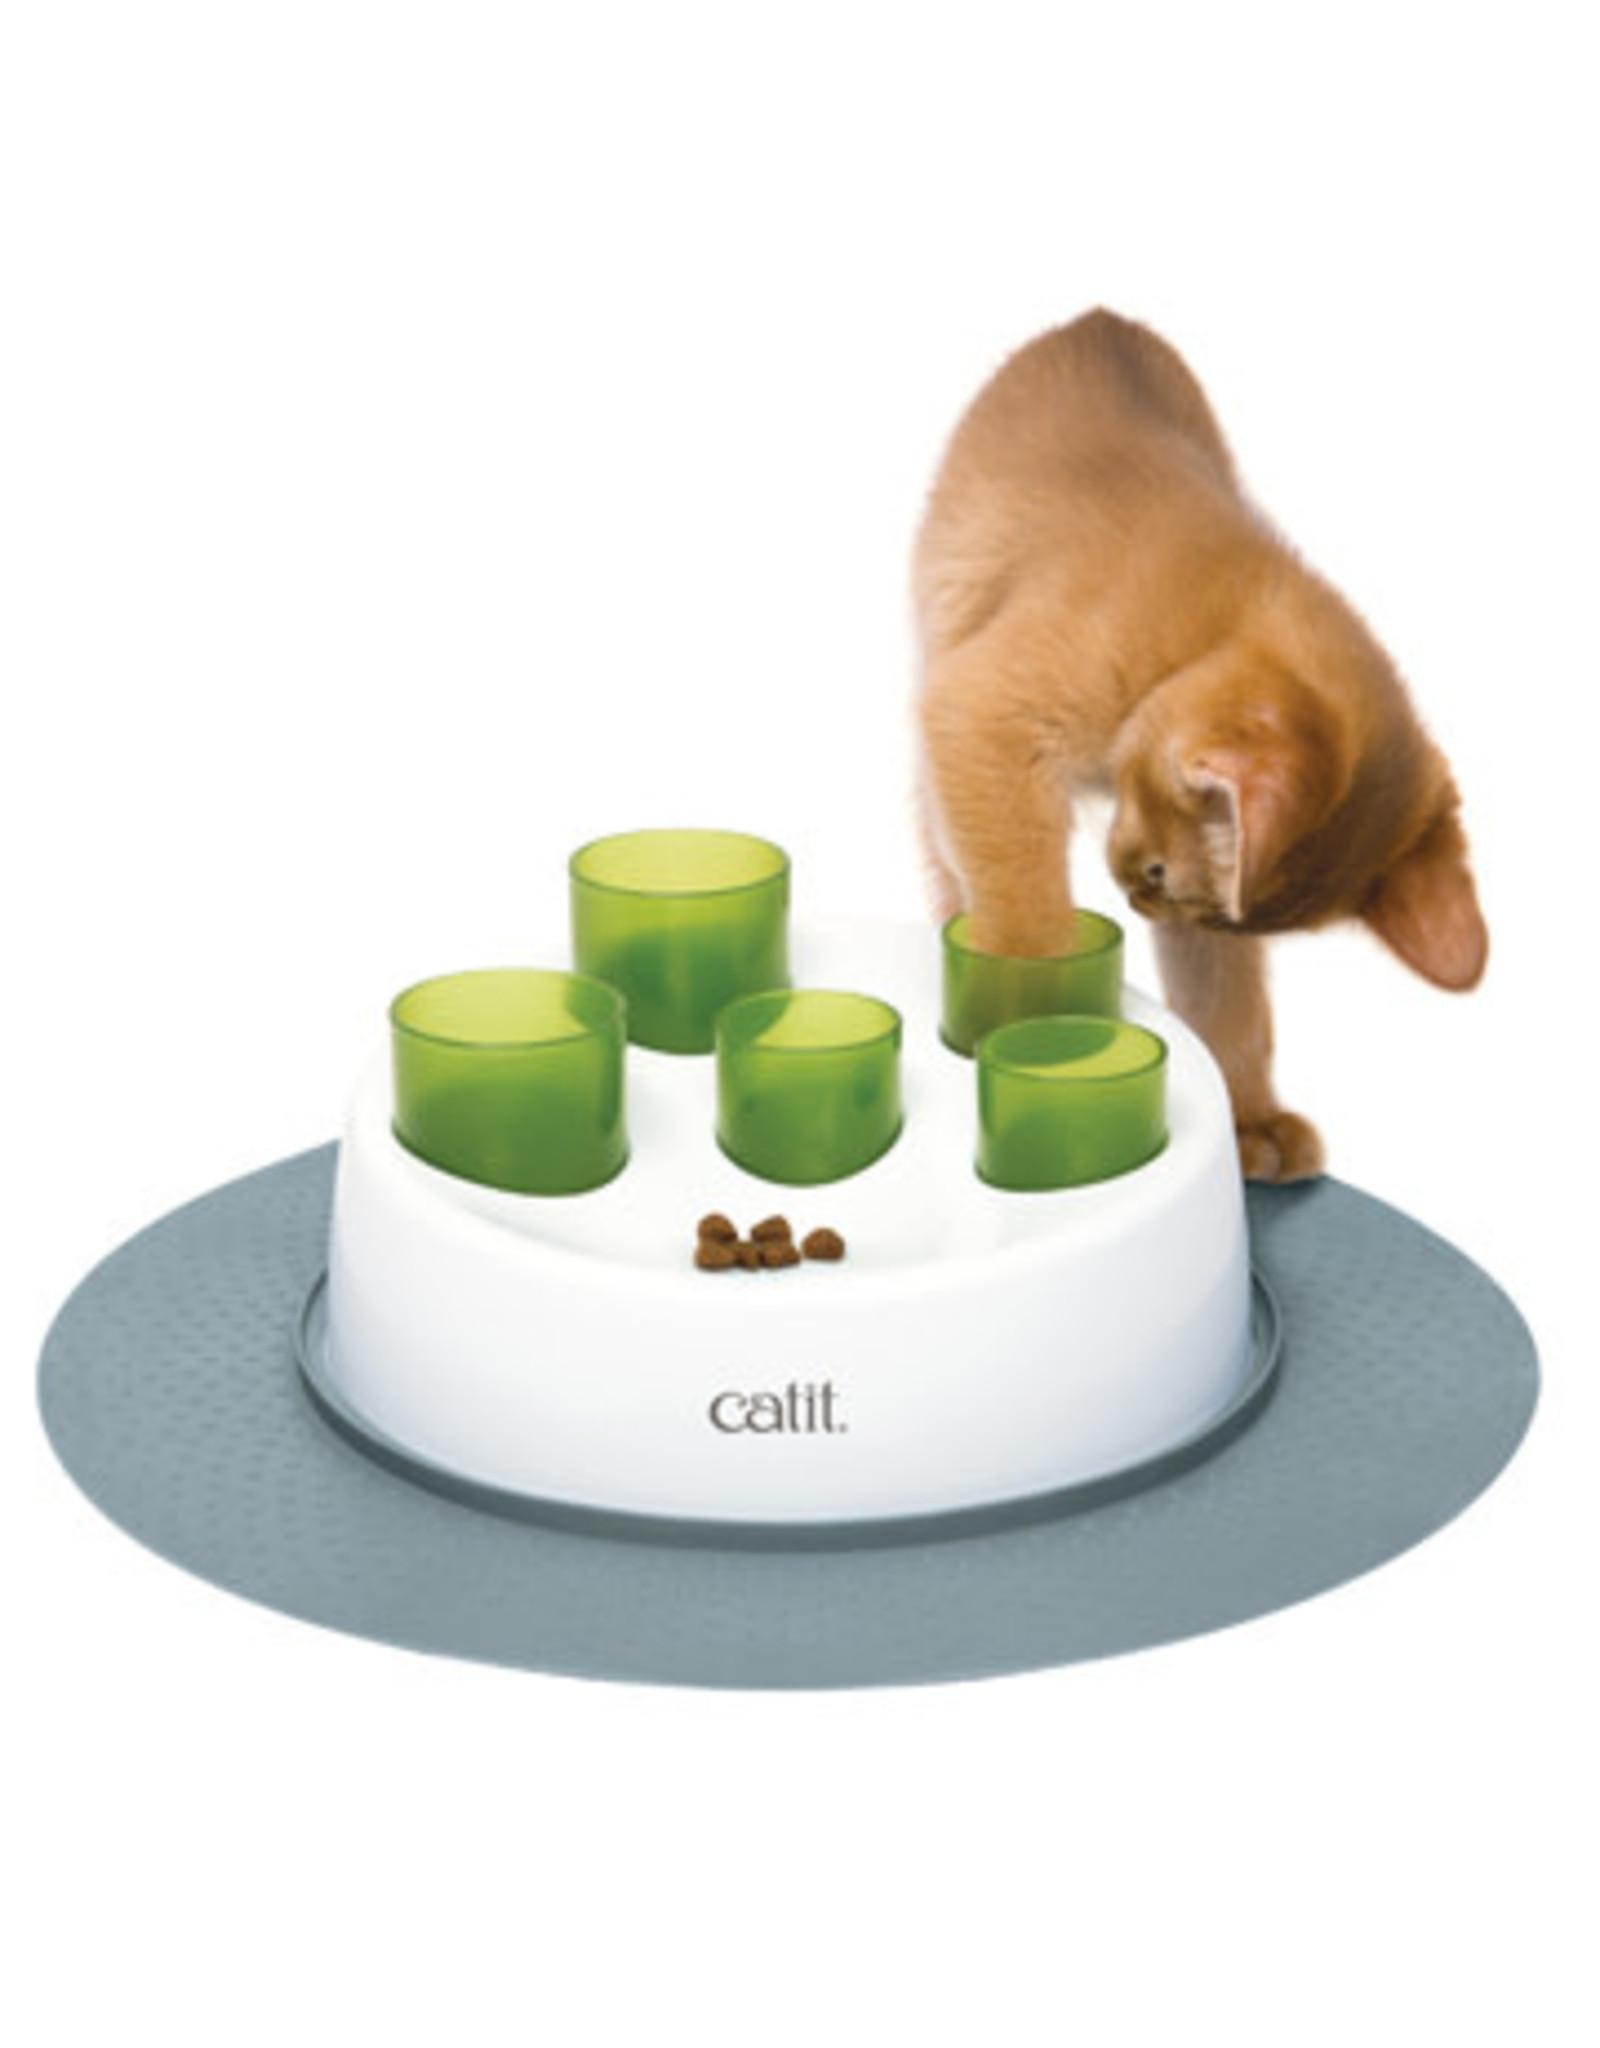 CT - Catit 2.0 Catit Senses 2.0 Digger